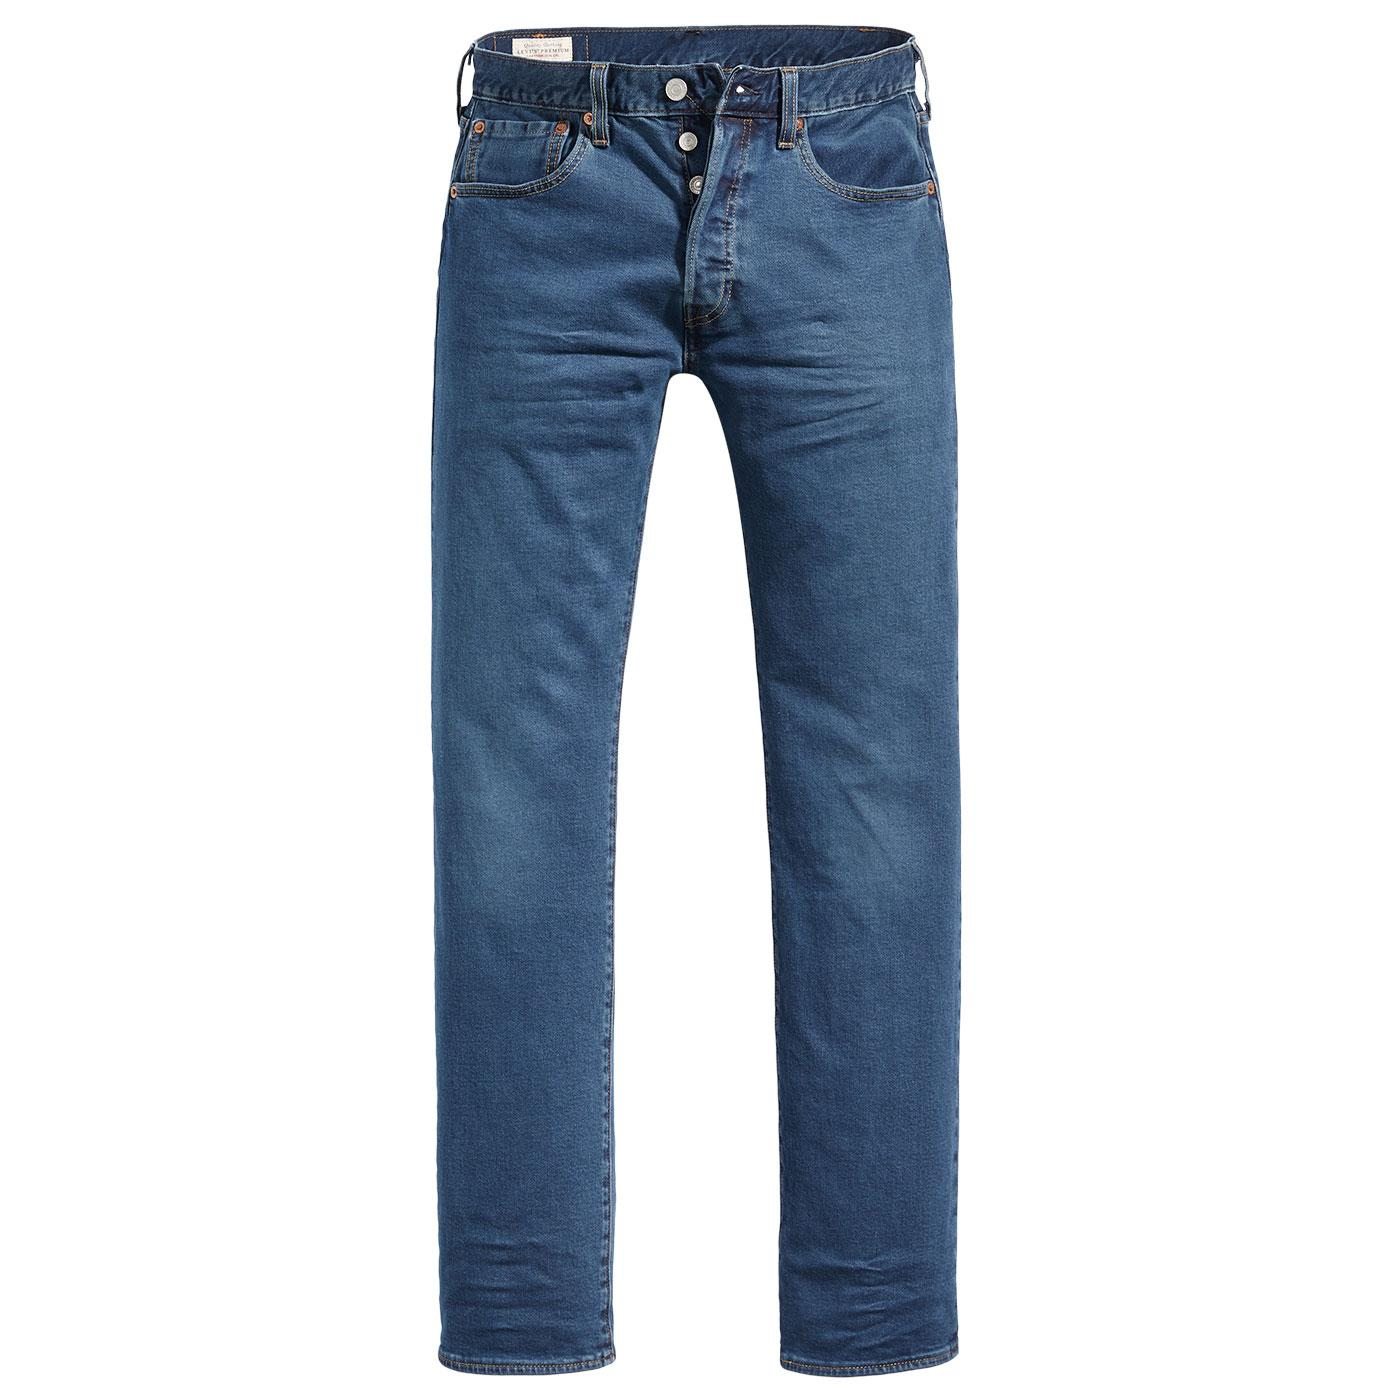 LEVI'S 501 Original Straight Denim Jeans Ironwood